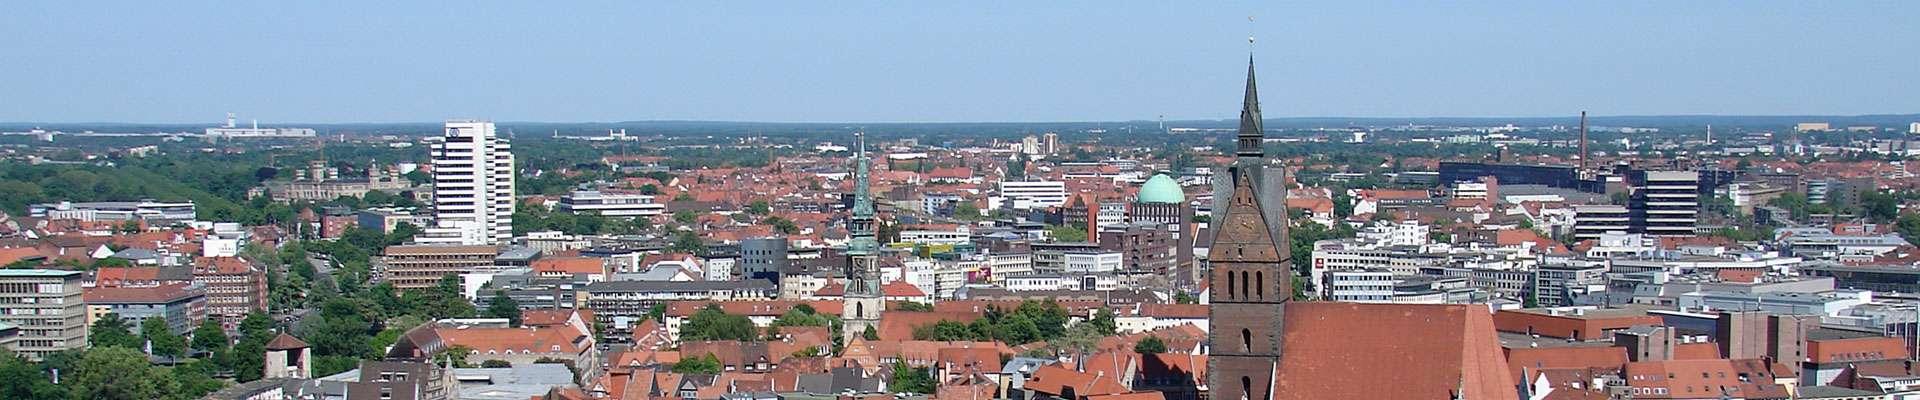 SEO Agentur Hannover